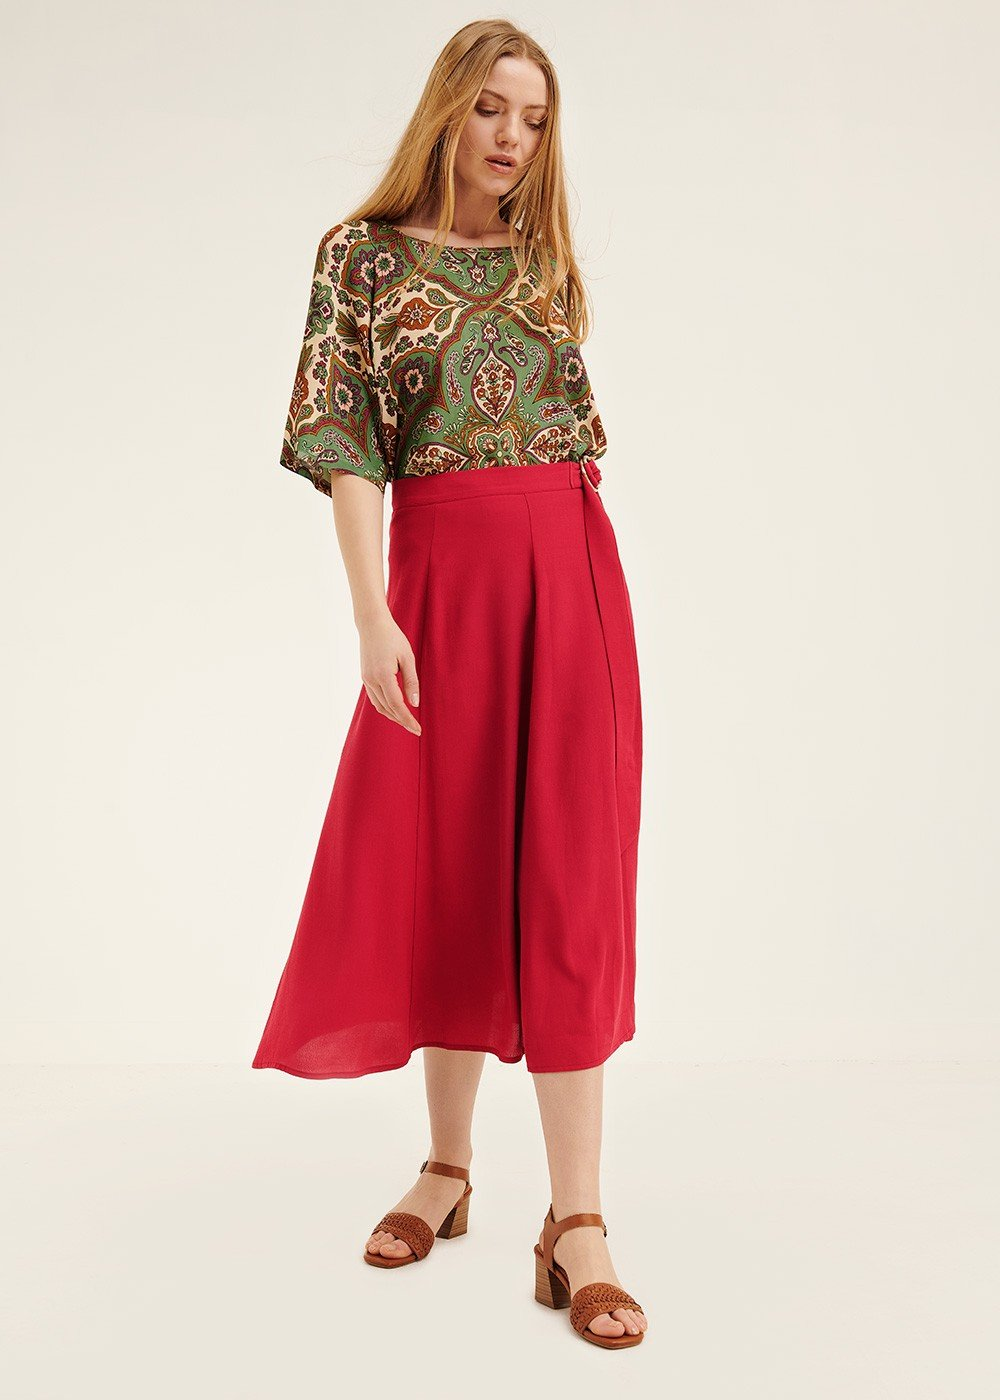 Geranio skirt with belt - Anemone - Woman